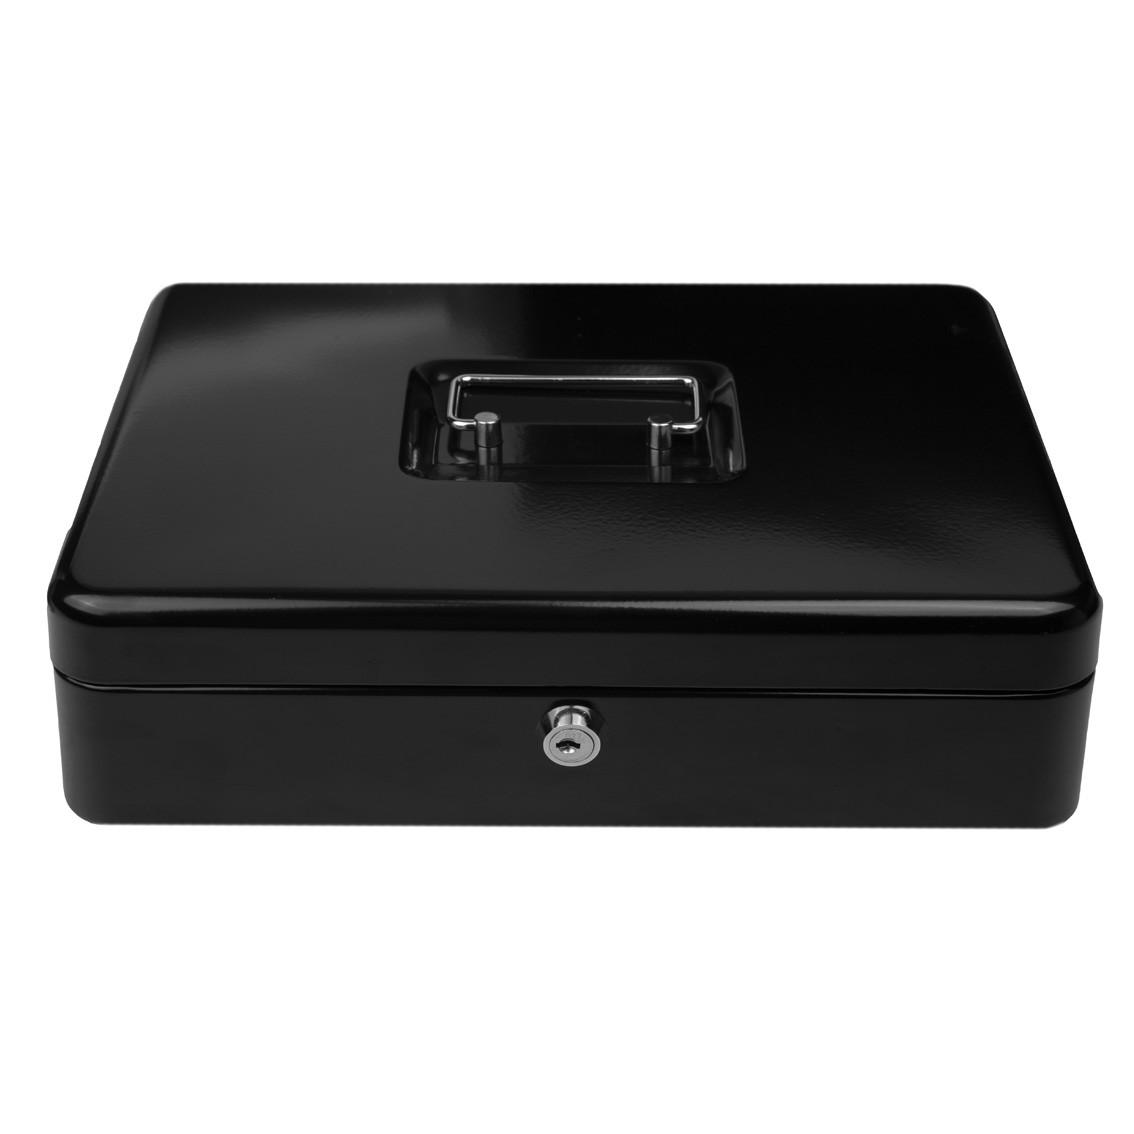 Металлическая коробка-кешбокс TS 0001